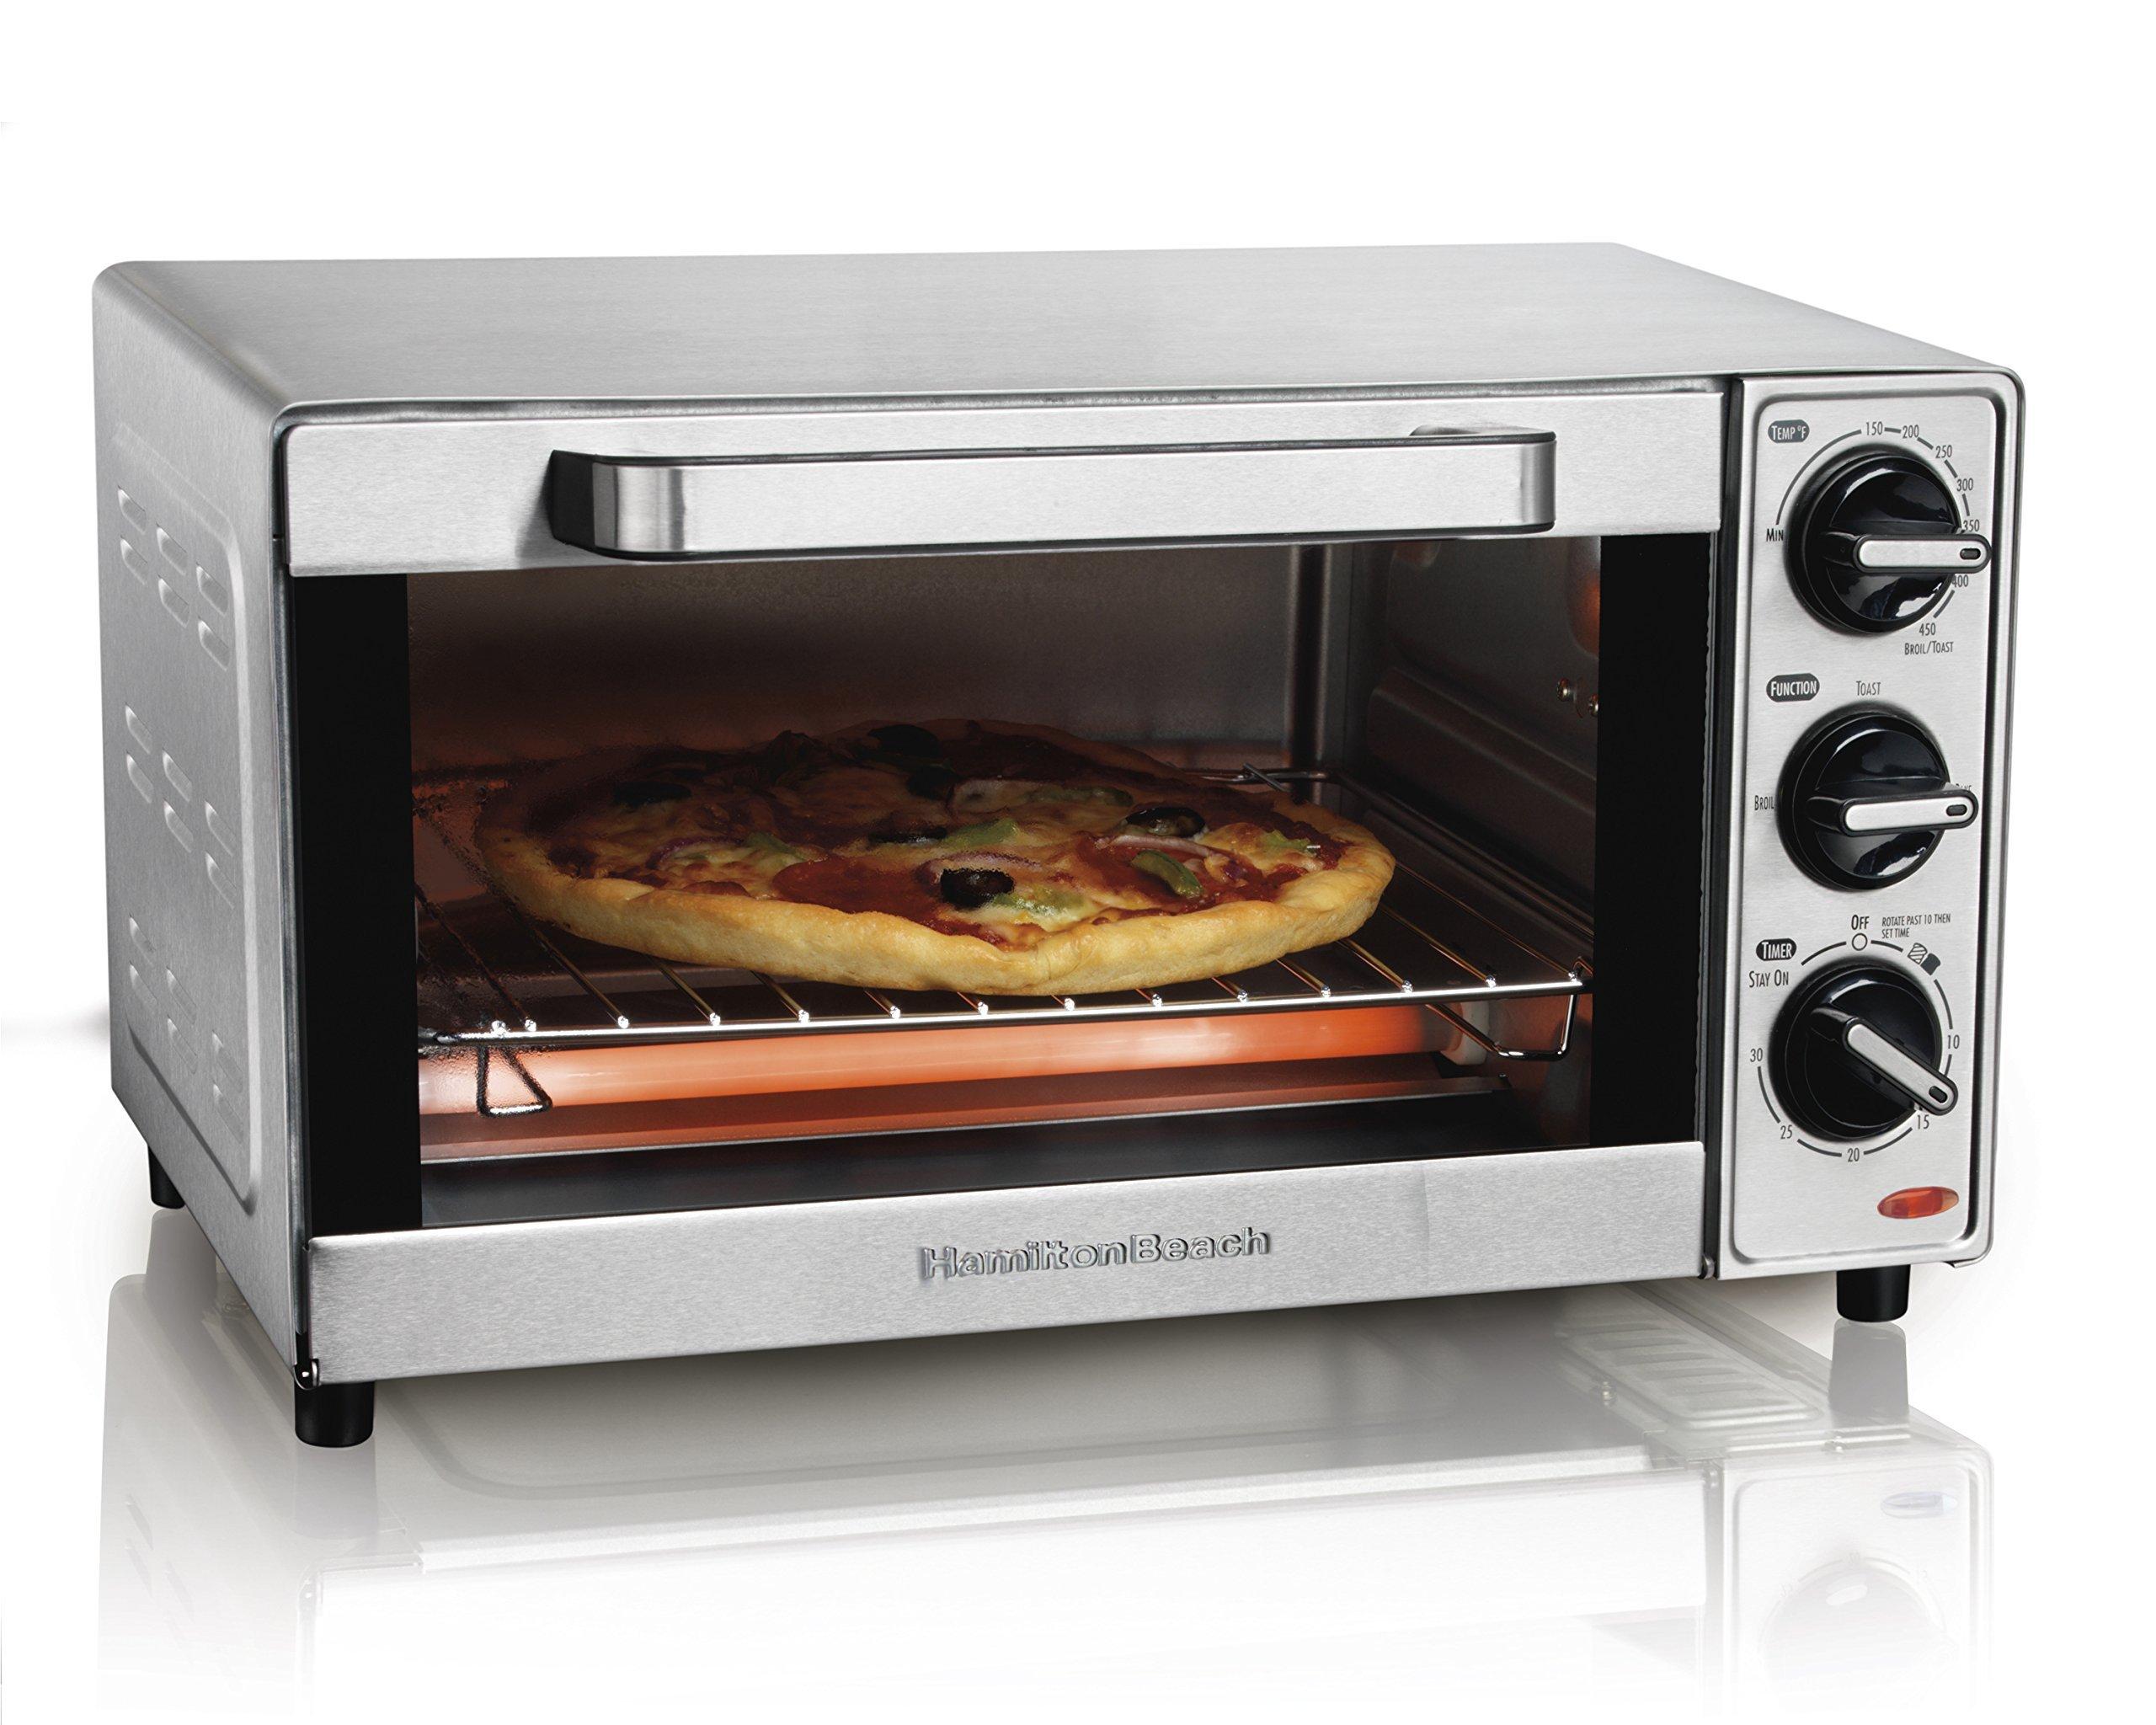 Hamilton Beach 31401 Stainless Steel 4 Slice Toaster Oven Broiler (Renewed) by Hamilton Beach